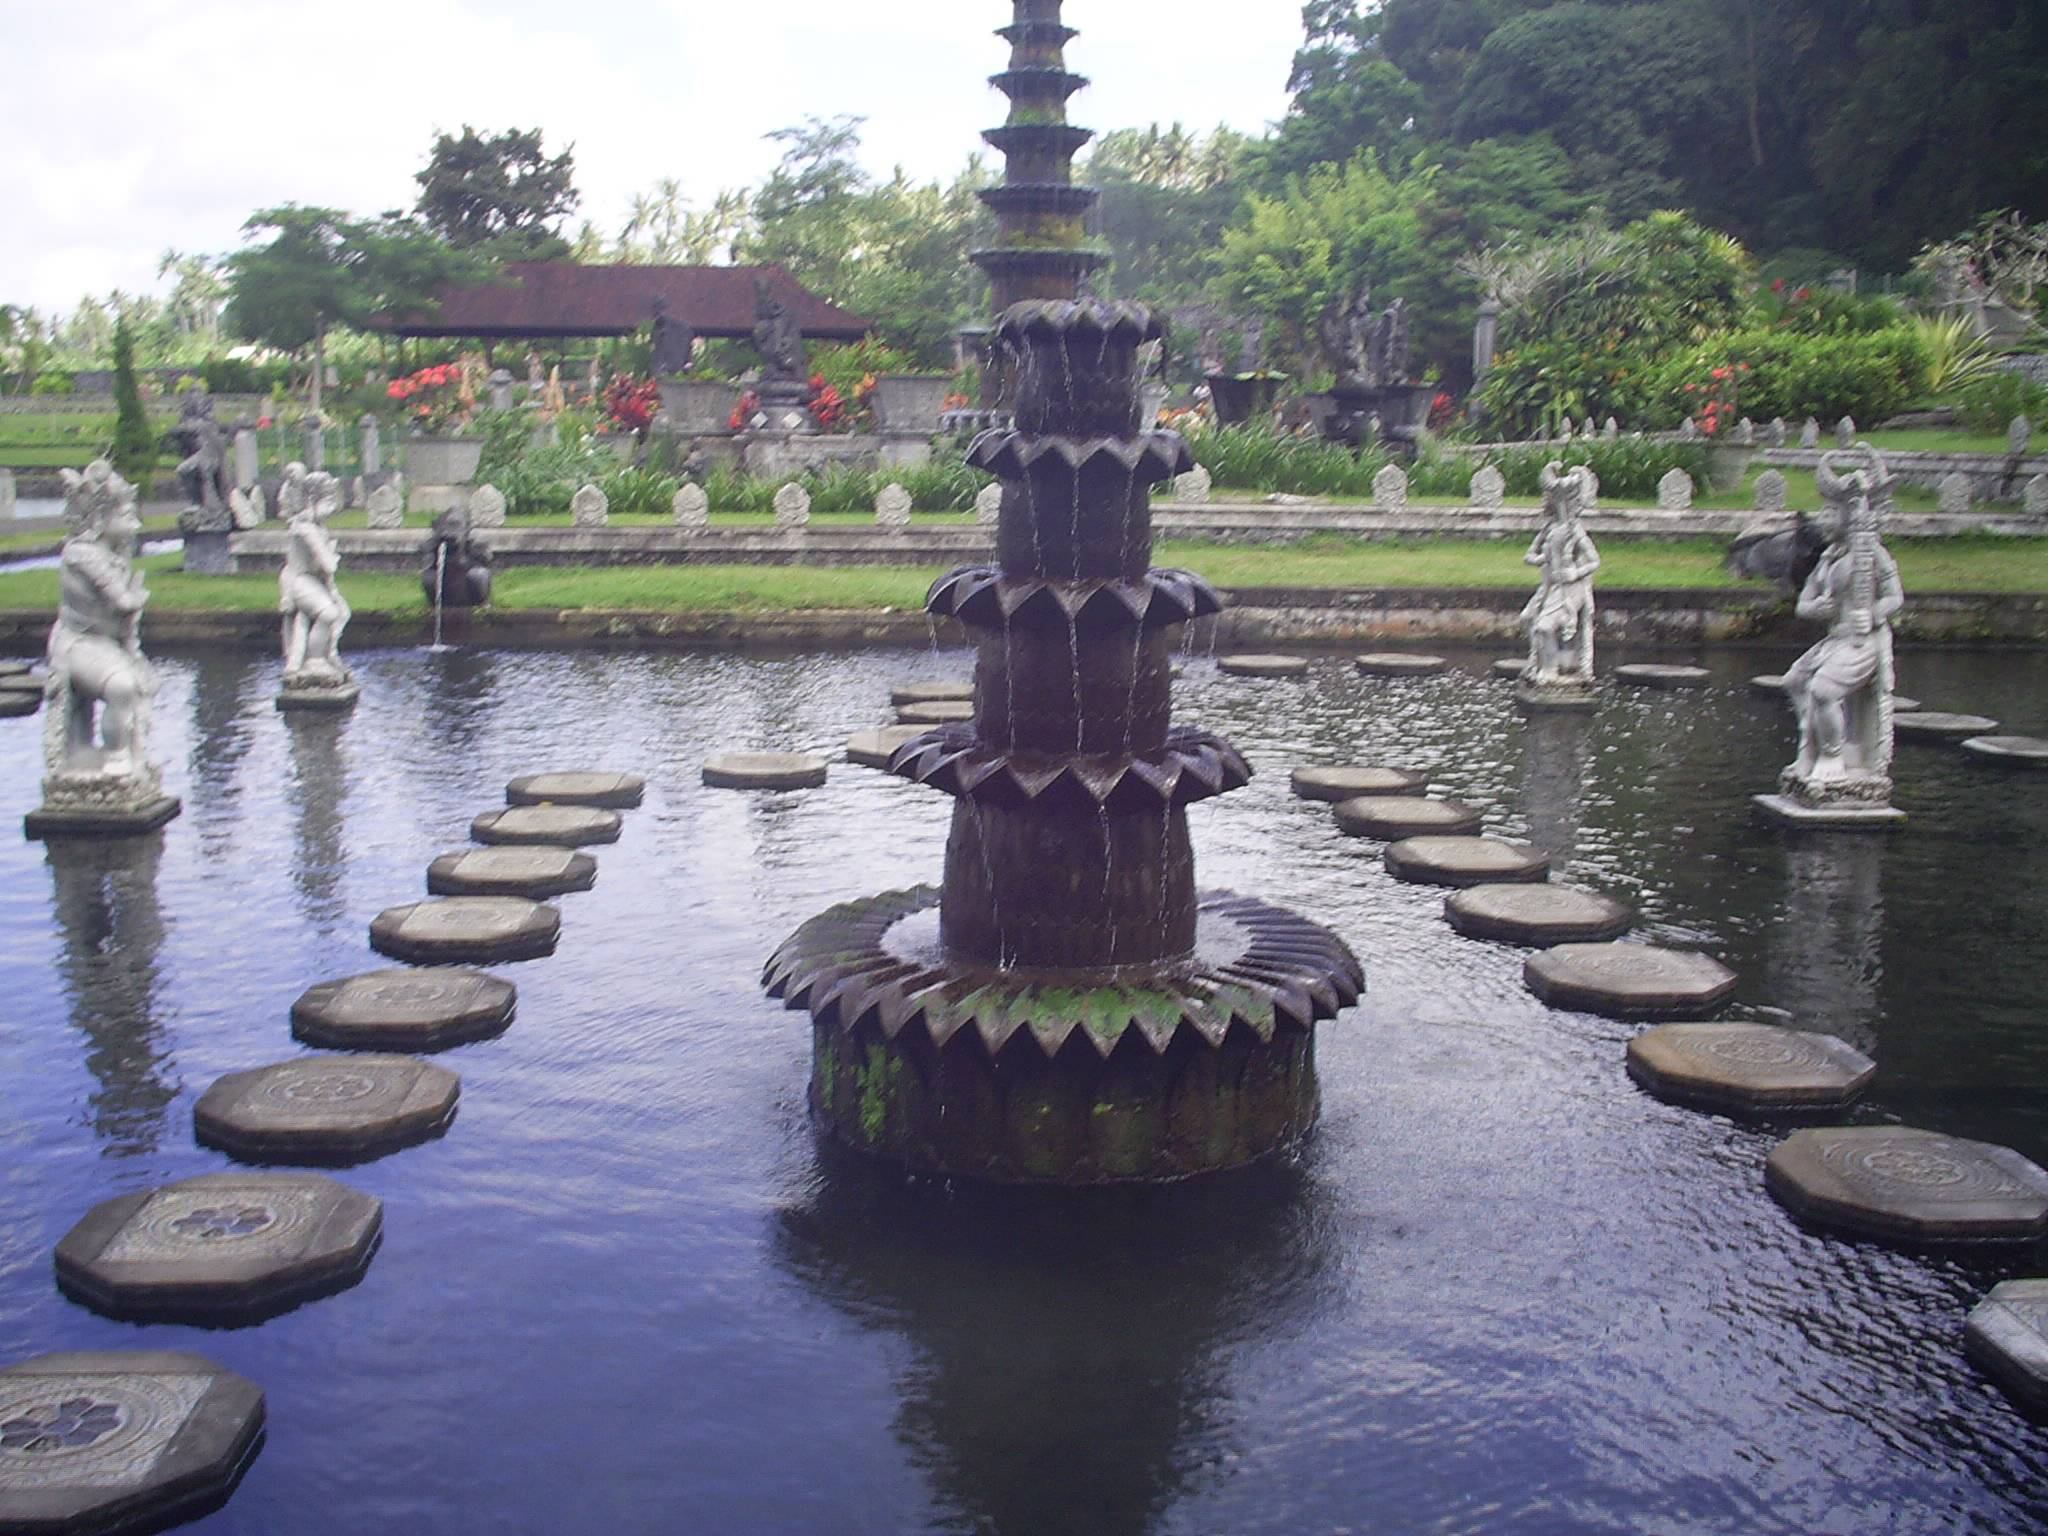 Photo 3: Tirta Gangga, le palais de l'eau